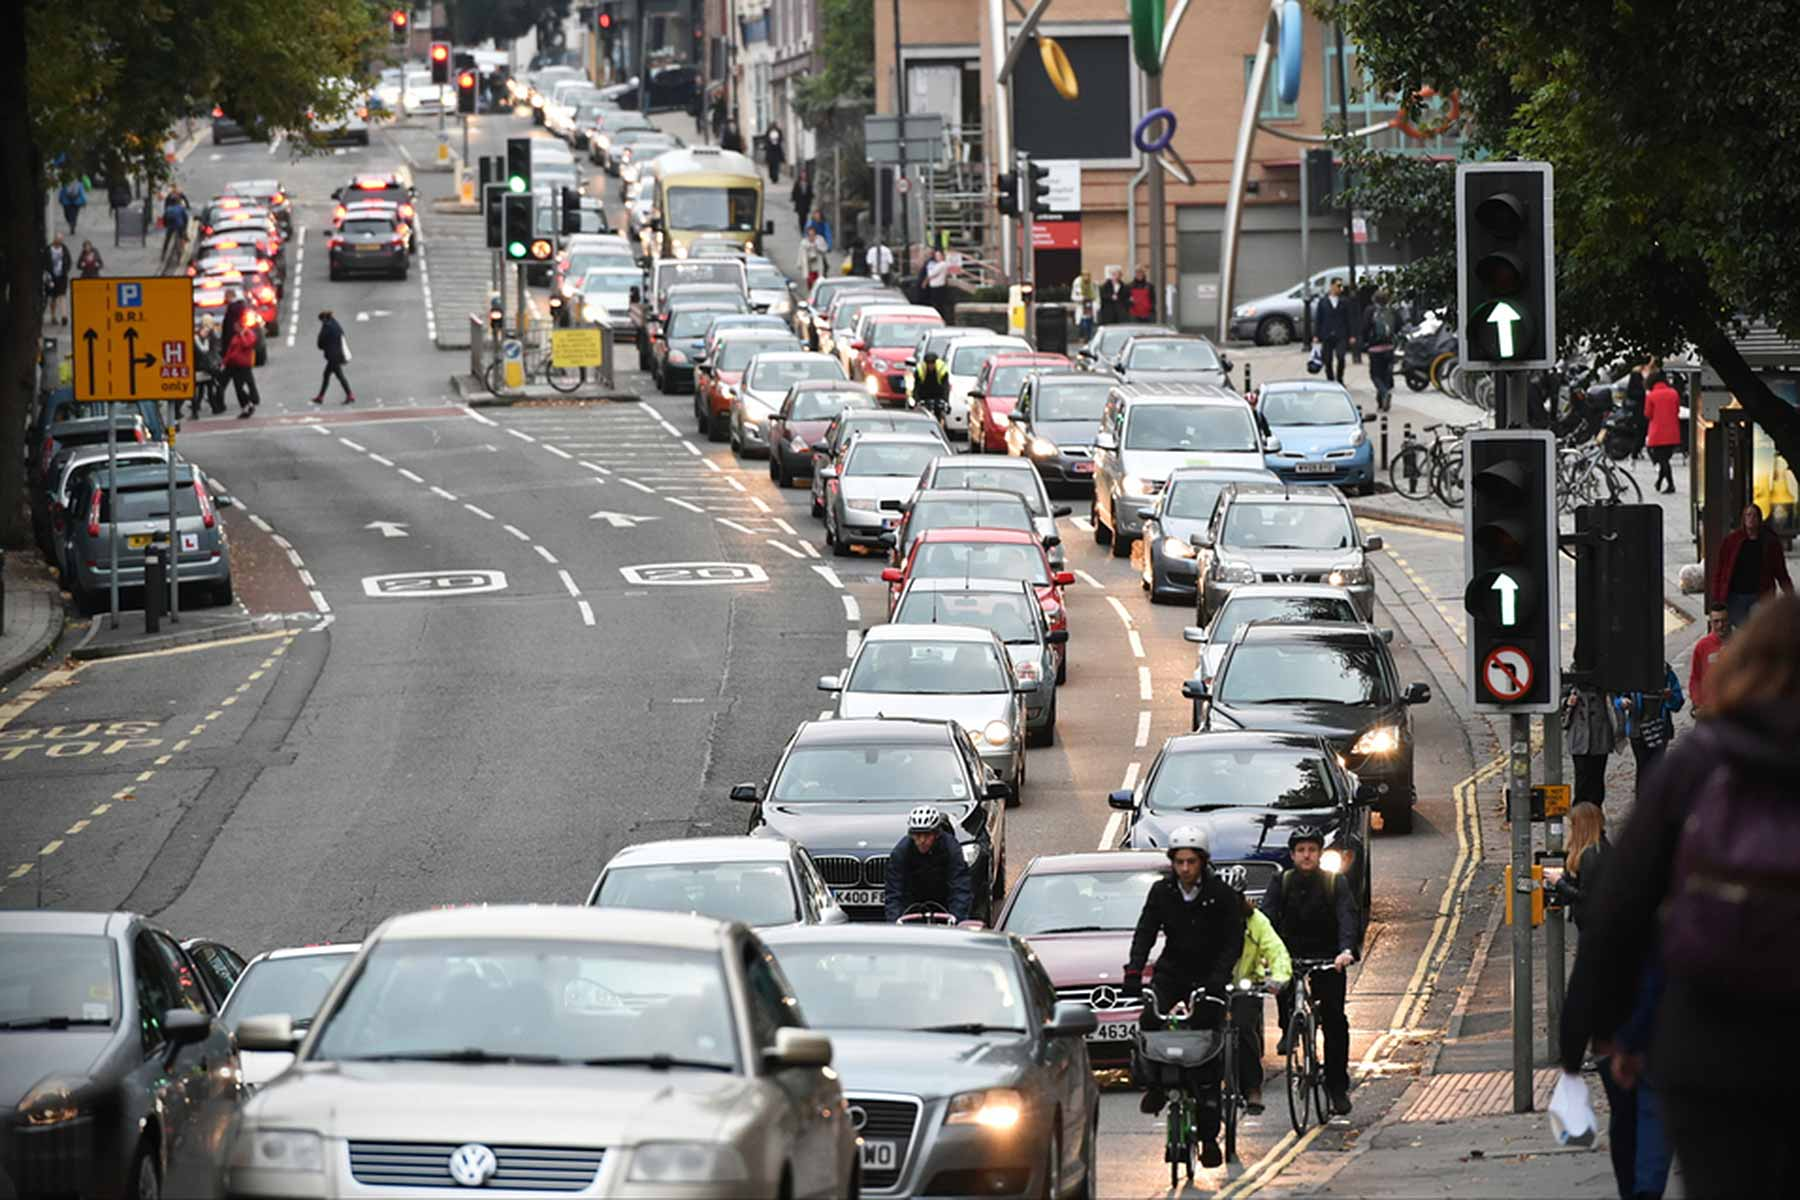 Snarled-up traffic jam